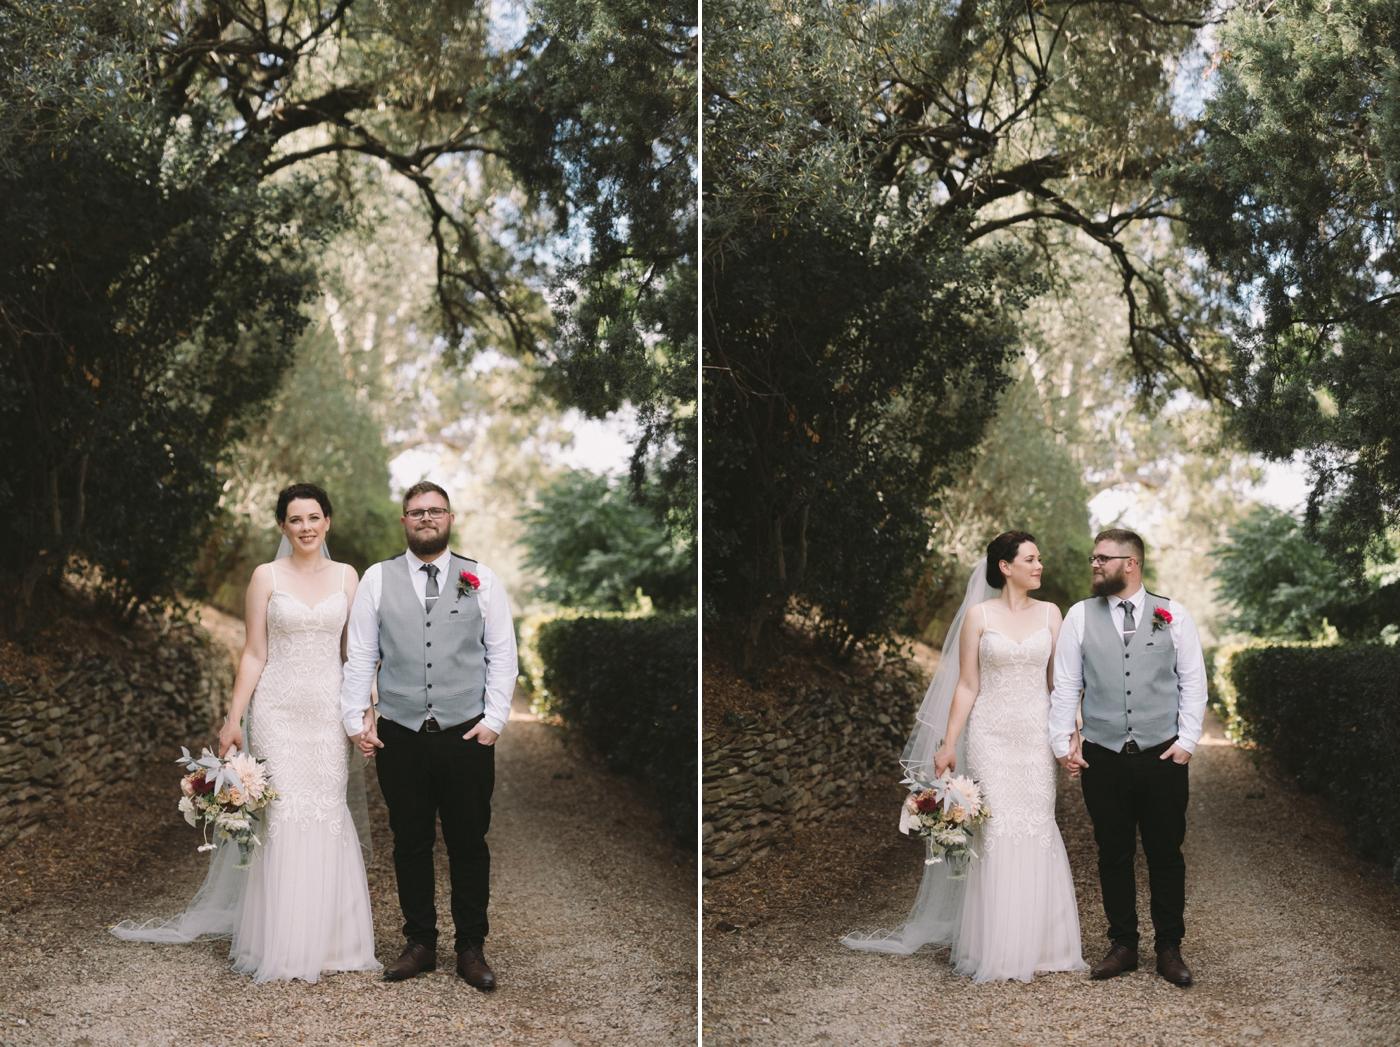 Emma & Aaron - Marybank Estate Wedding - Natural Wedding Photography in Adelaide - www.katherineschultzphotography.com_0053.jpg